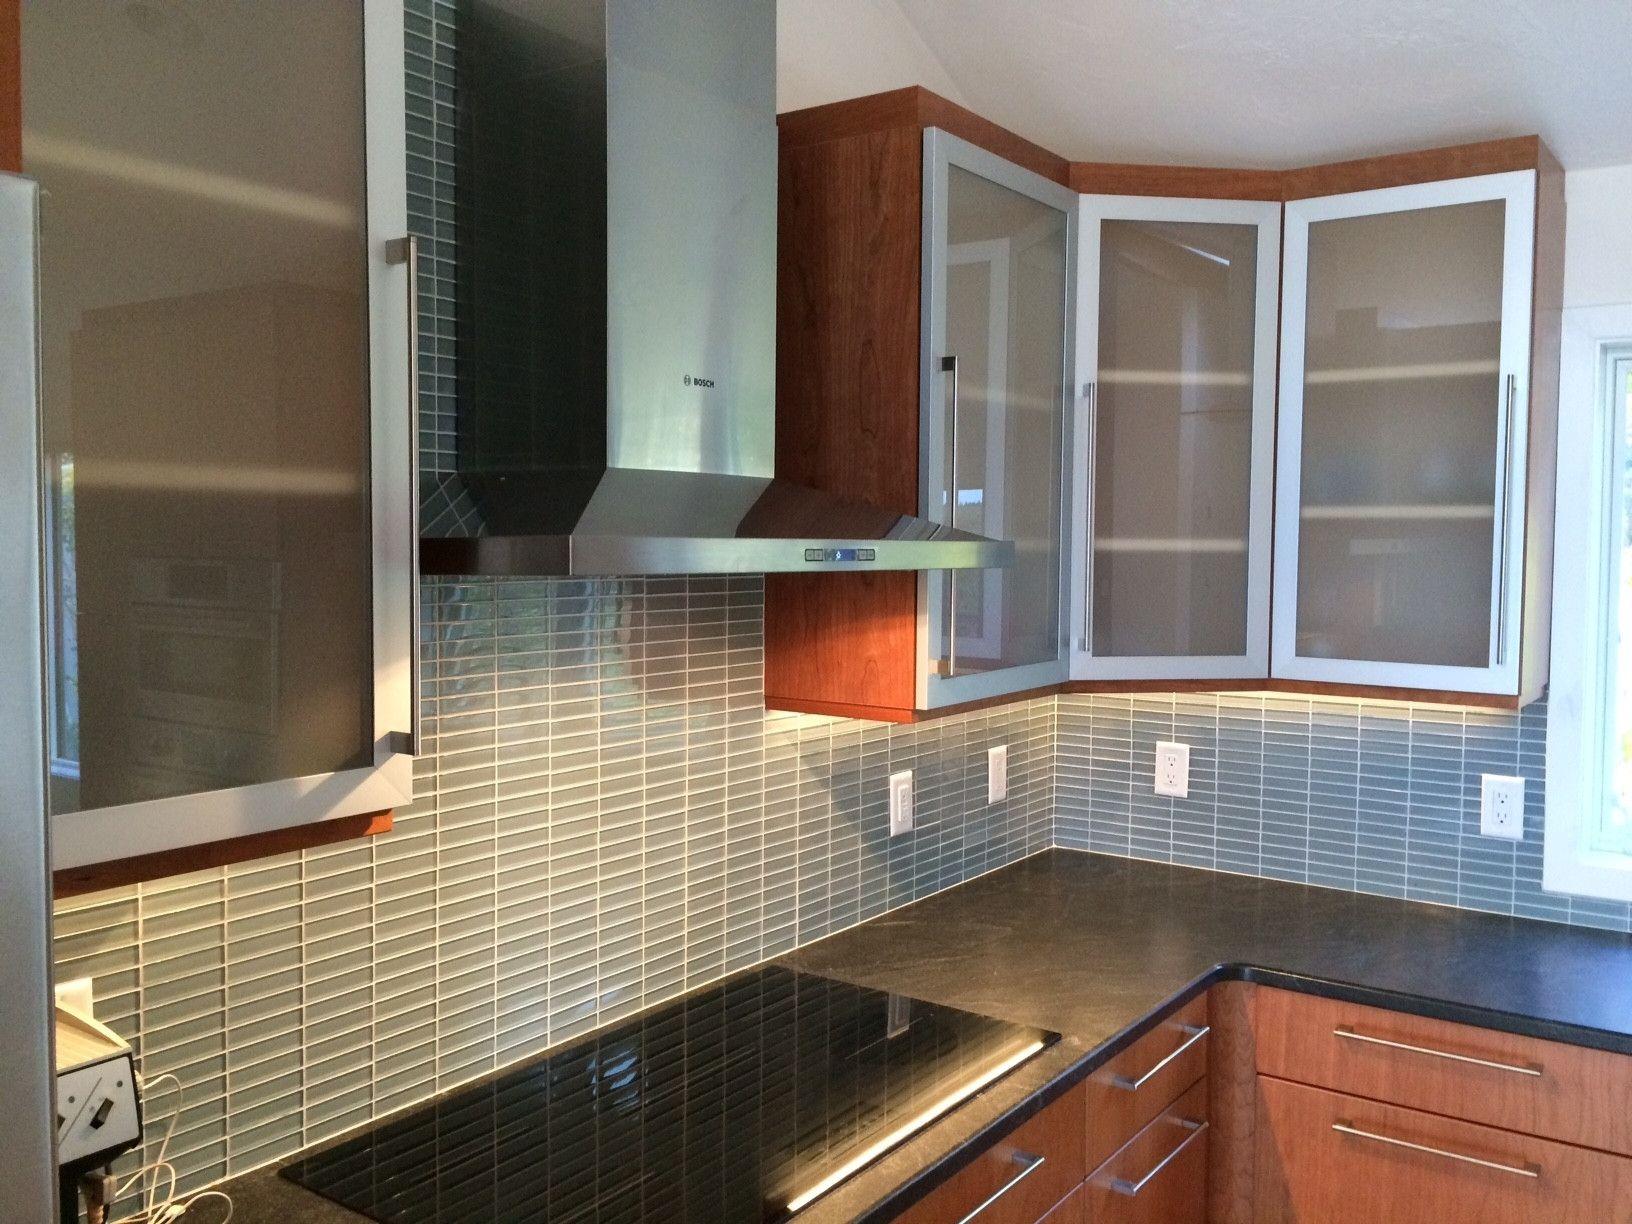 Pin By Rahayu12 On Interior Analogi Cabinet Doors Glass Cabinet